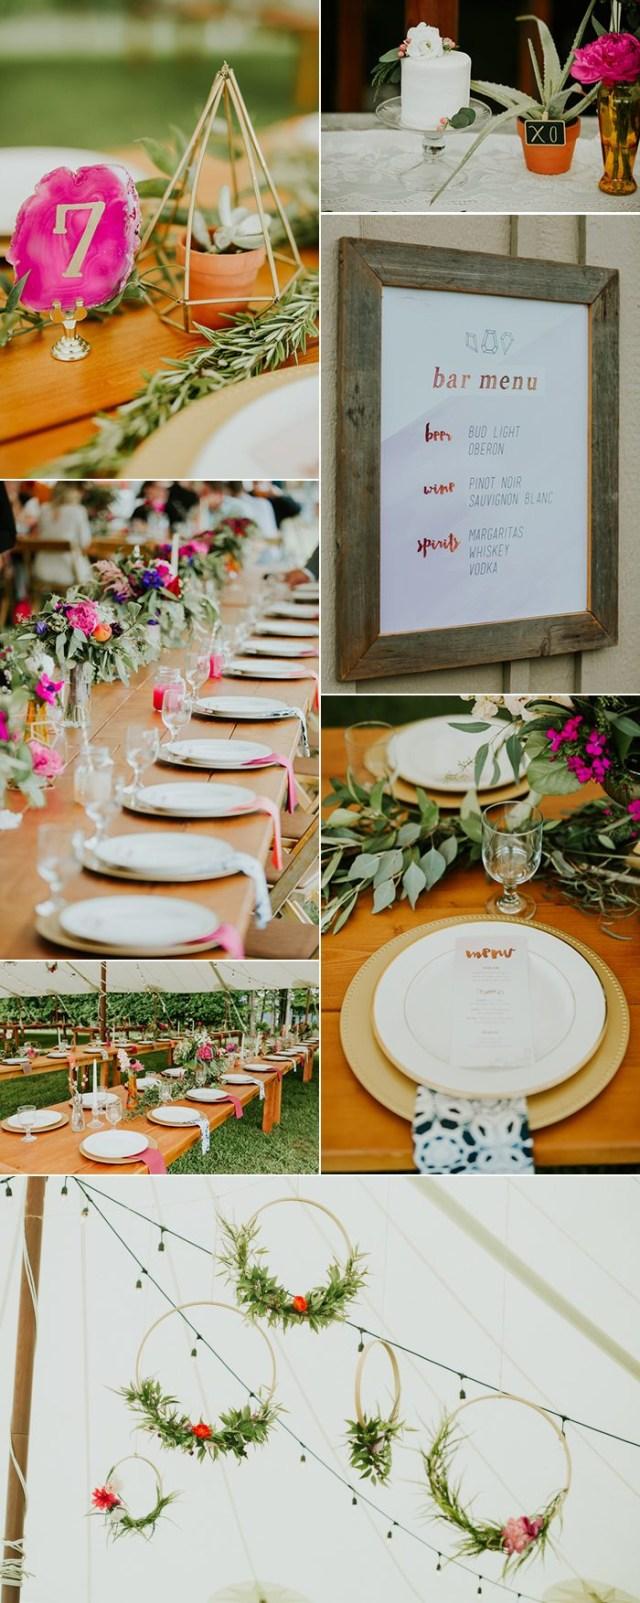 Upcycled Wedding Decorations 9 Couples Who Nailed Their Diy Weddings Junebug Weddings